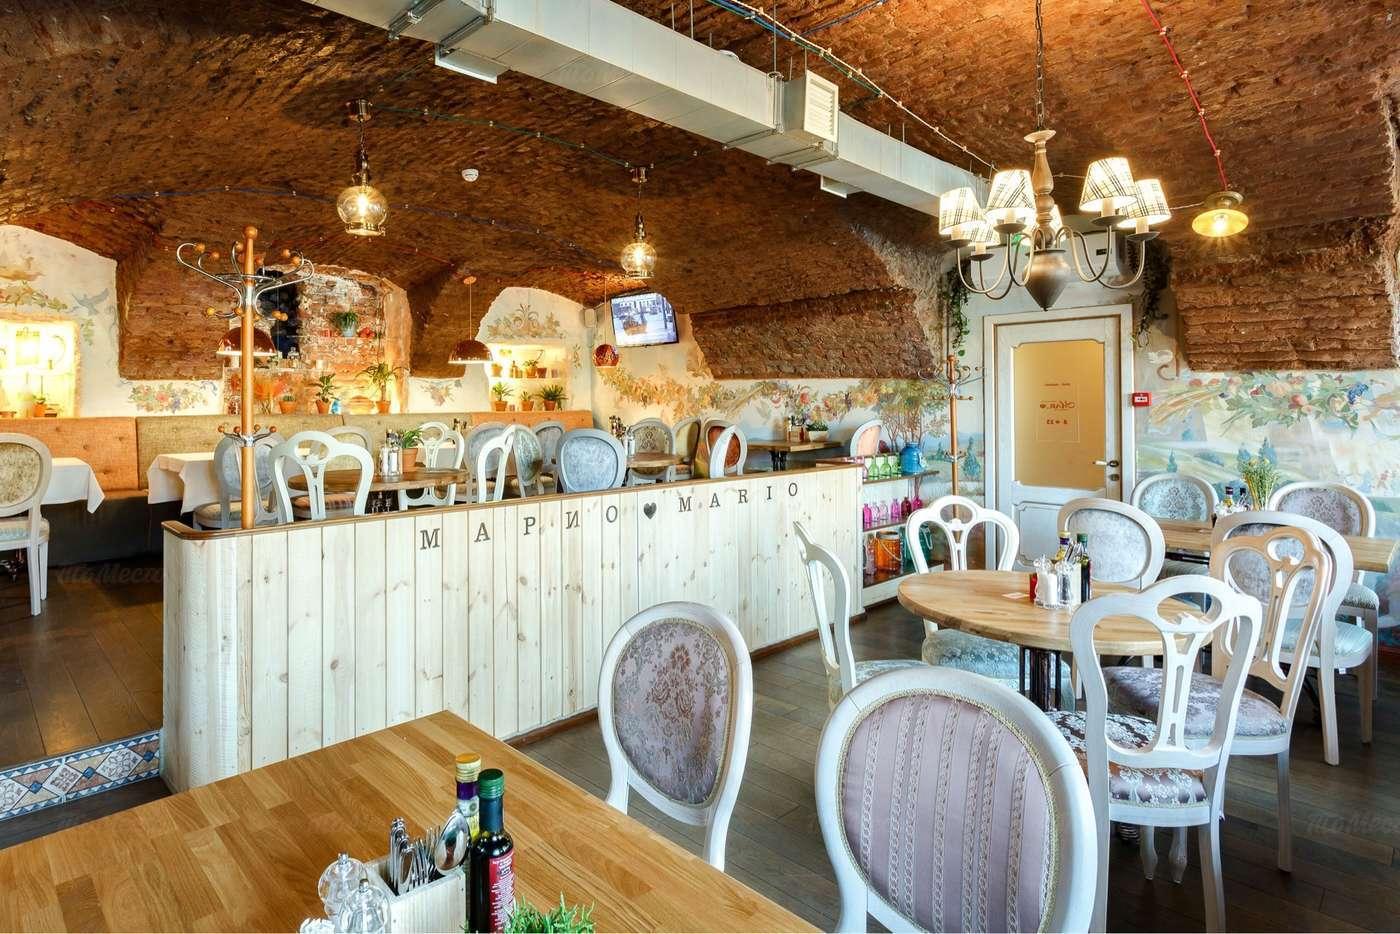 Ресторан Mario Trattoria (Марио Траттория) на Адмиралтейском проспекте фото 7